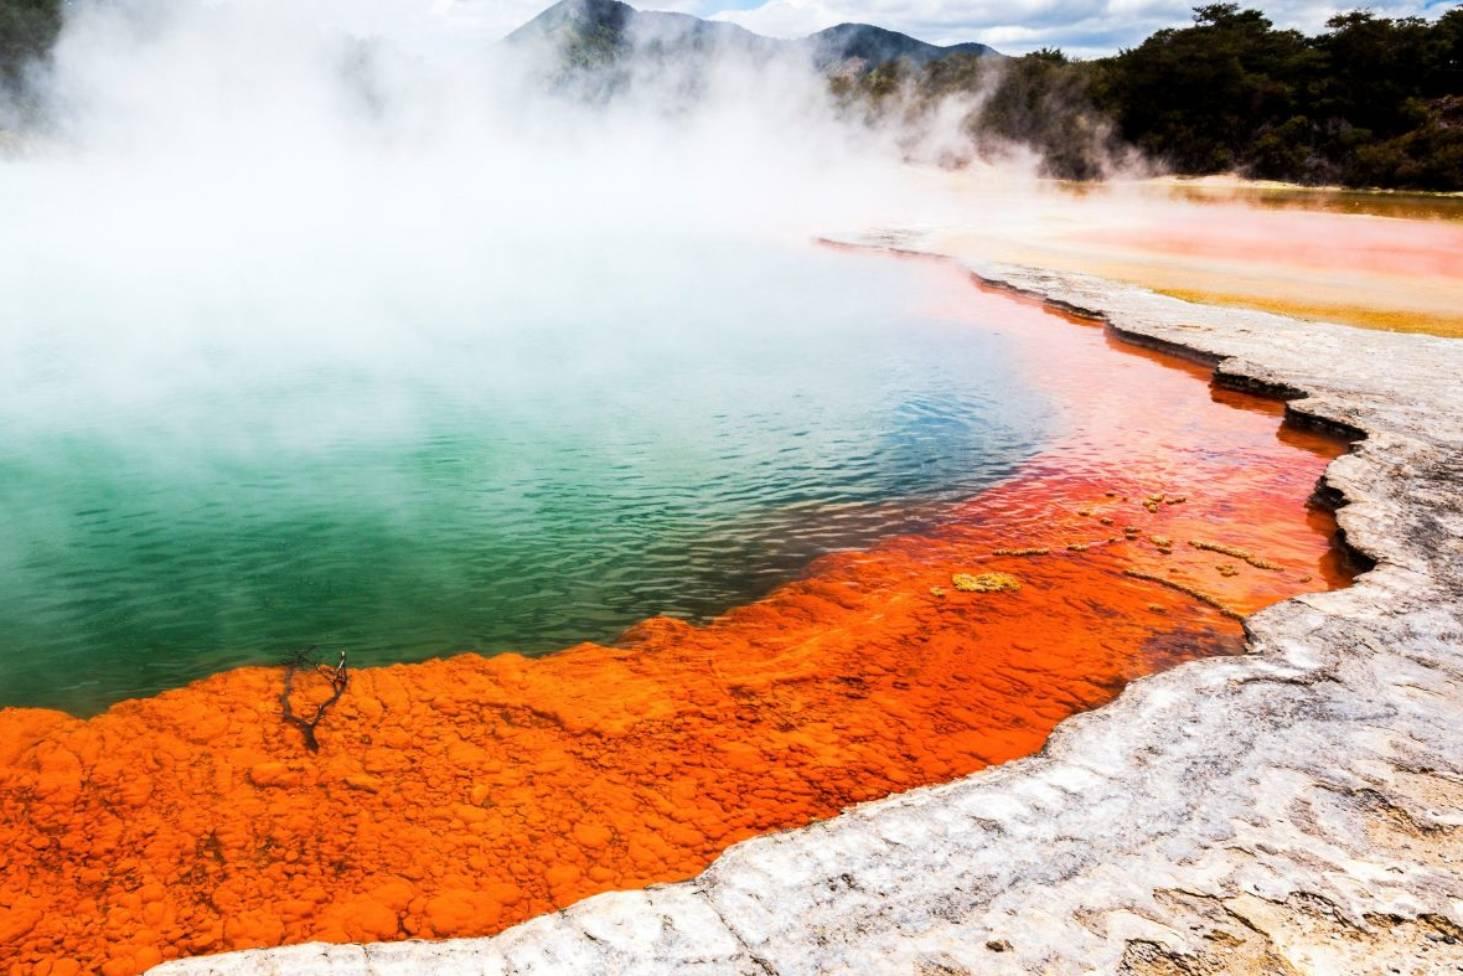 Wai-O-Tapu Thermal Wonderland: New Zealand's bizarre landscape that's 'hell on earth' | Stuff.co.nz